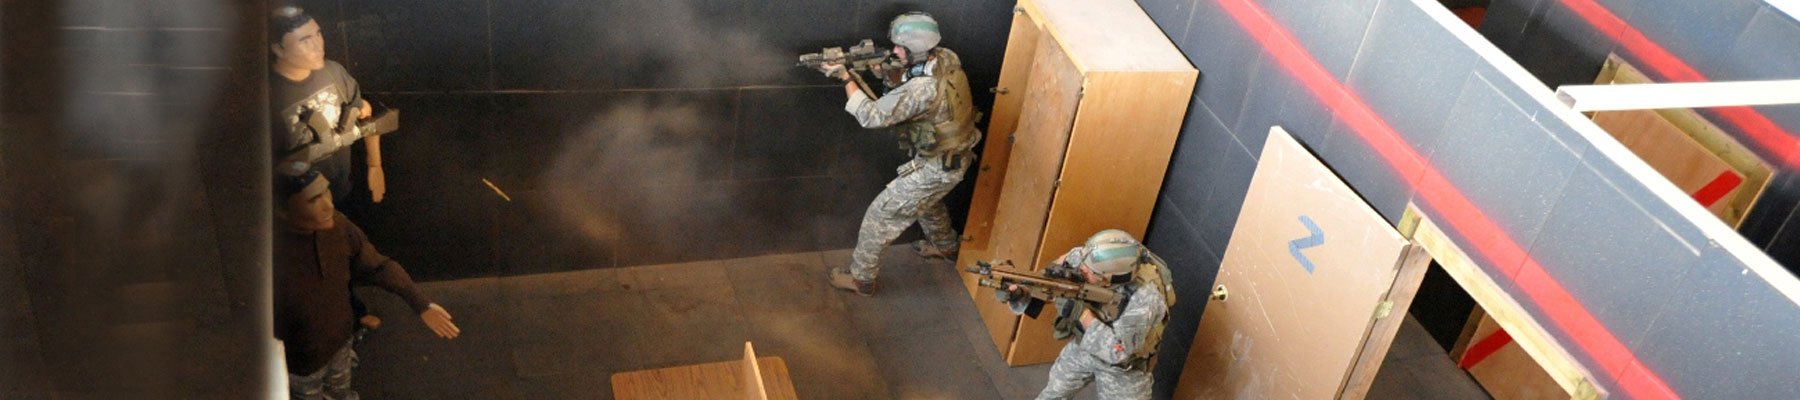 MotoShot - Use of Force Threat Management Trainer